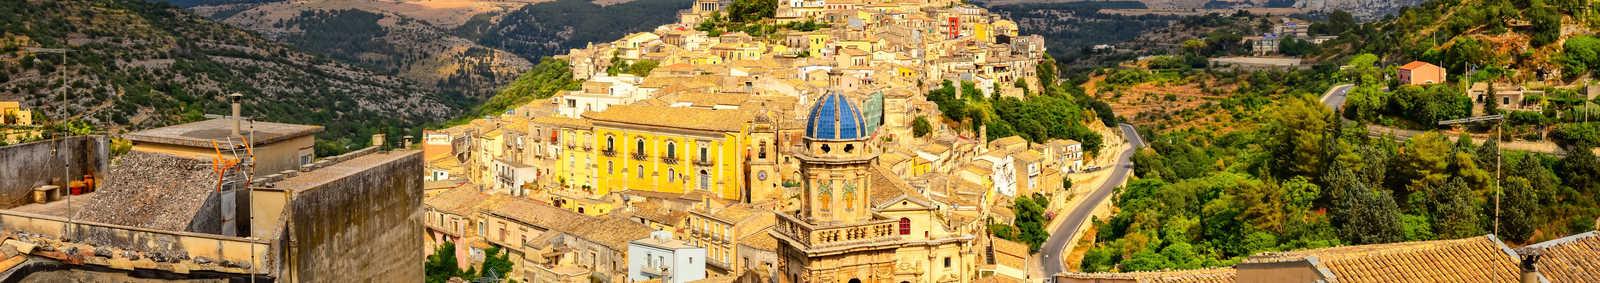 Beautiful village of Ragusa, Sicily, italy